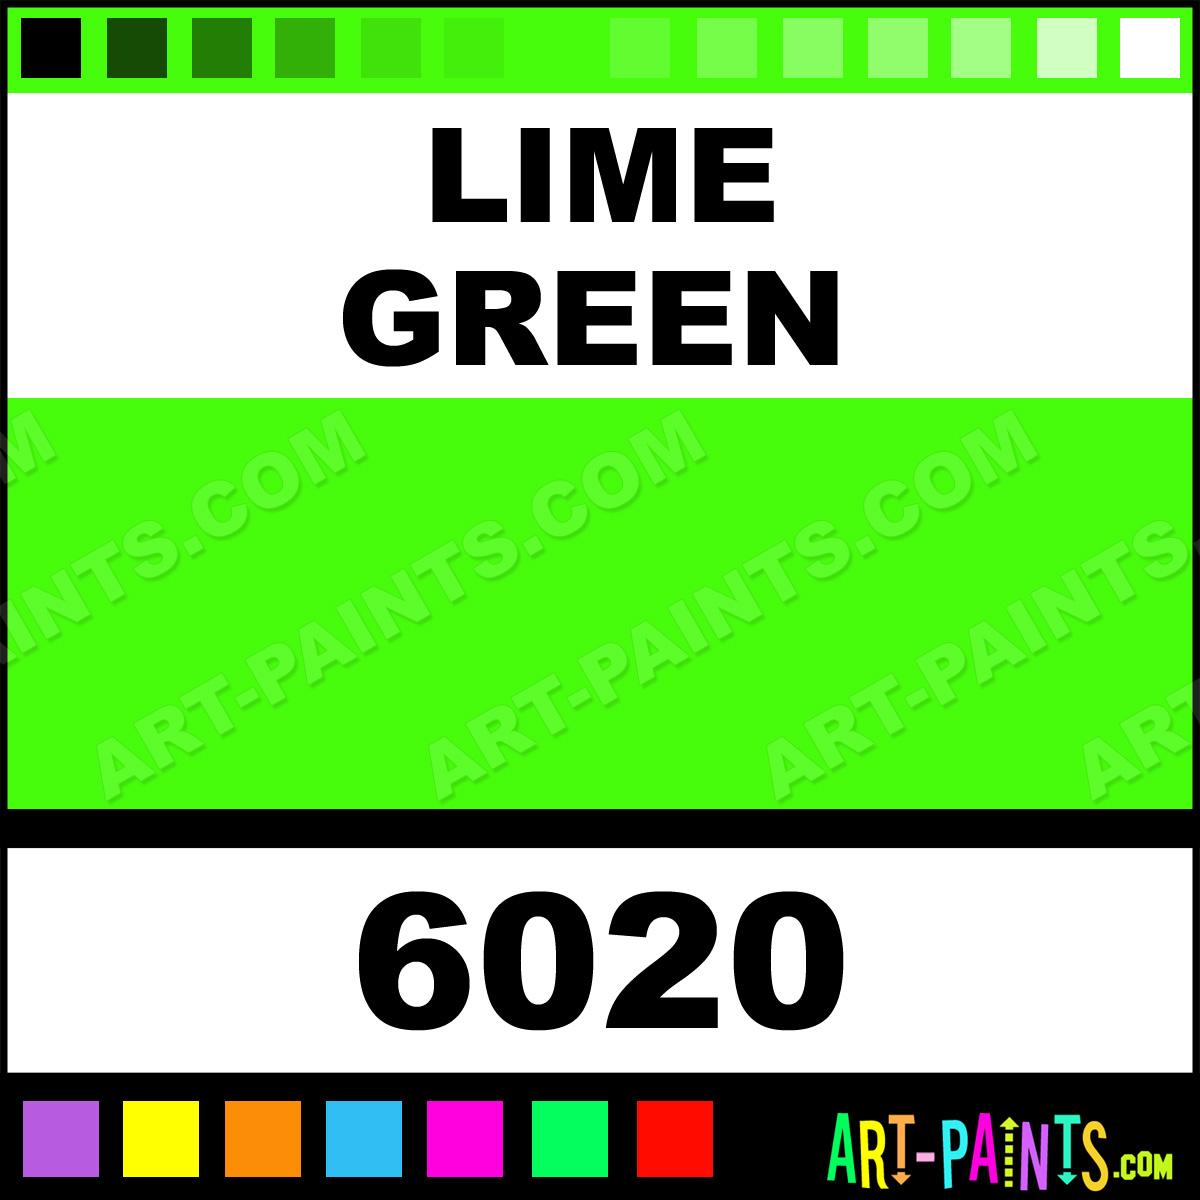 Lime Green Quality Spray Paints Aerosol Decorative Paints 6020 Lime Green Paint Graffiti